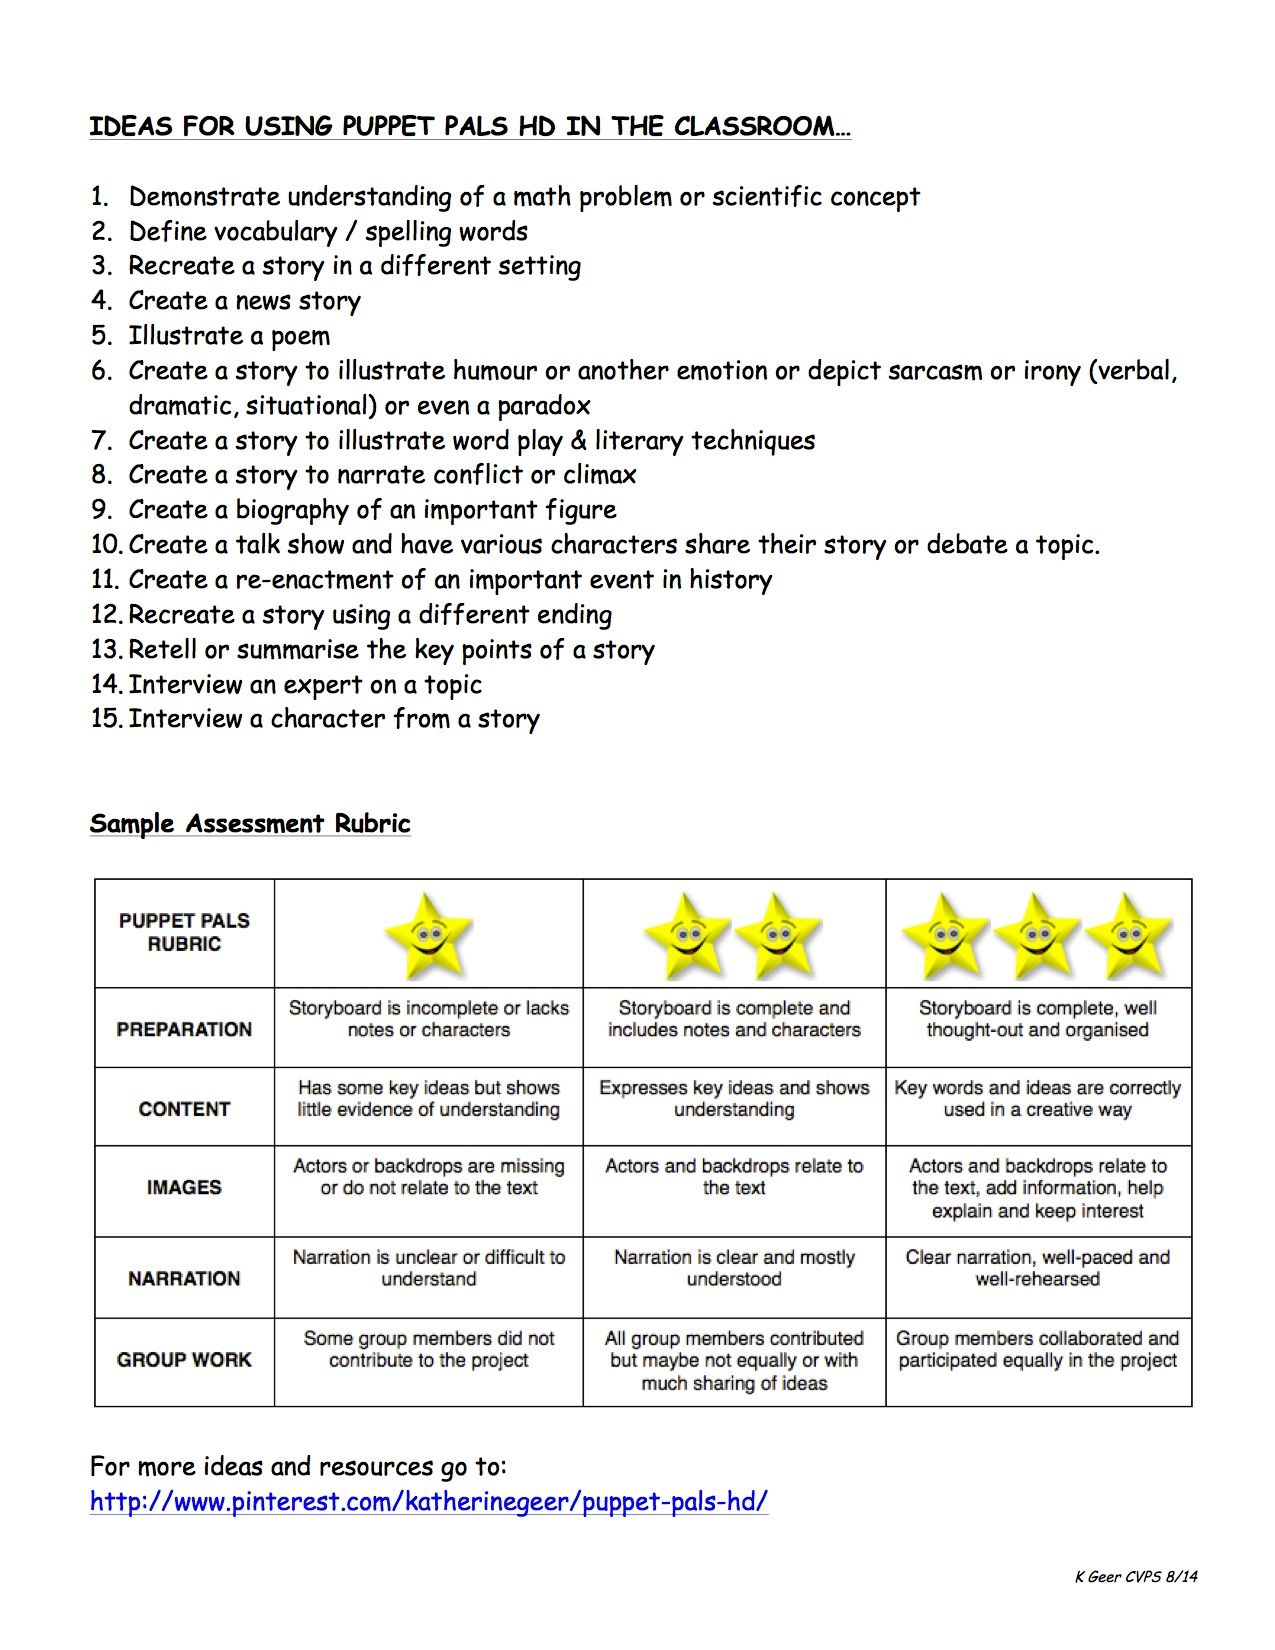 Puppet Pals Hd  Classroom Ideas Plus A Sample Assessment Rubric